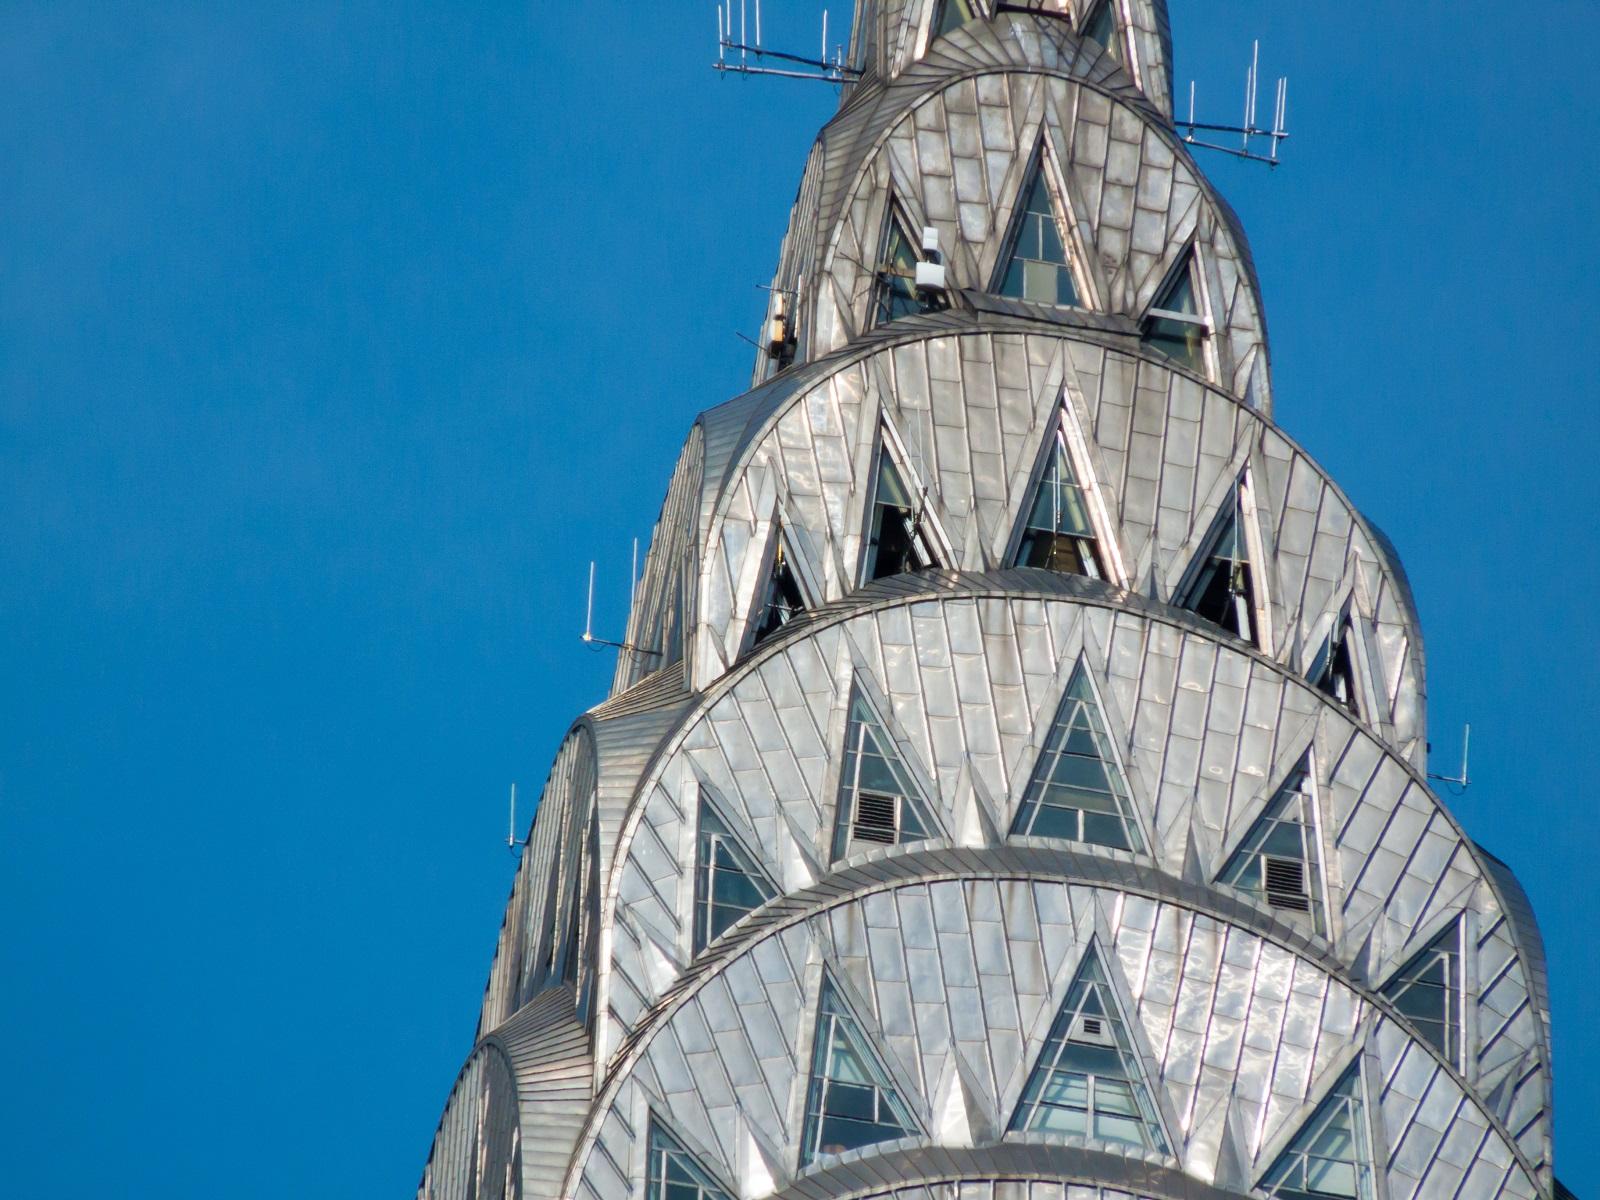 Iconic metal buildings - Chrysler building New York